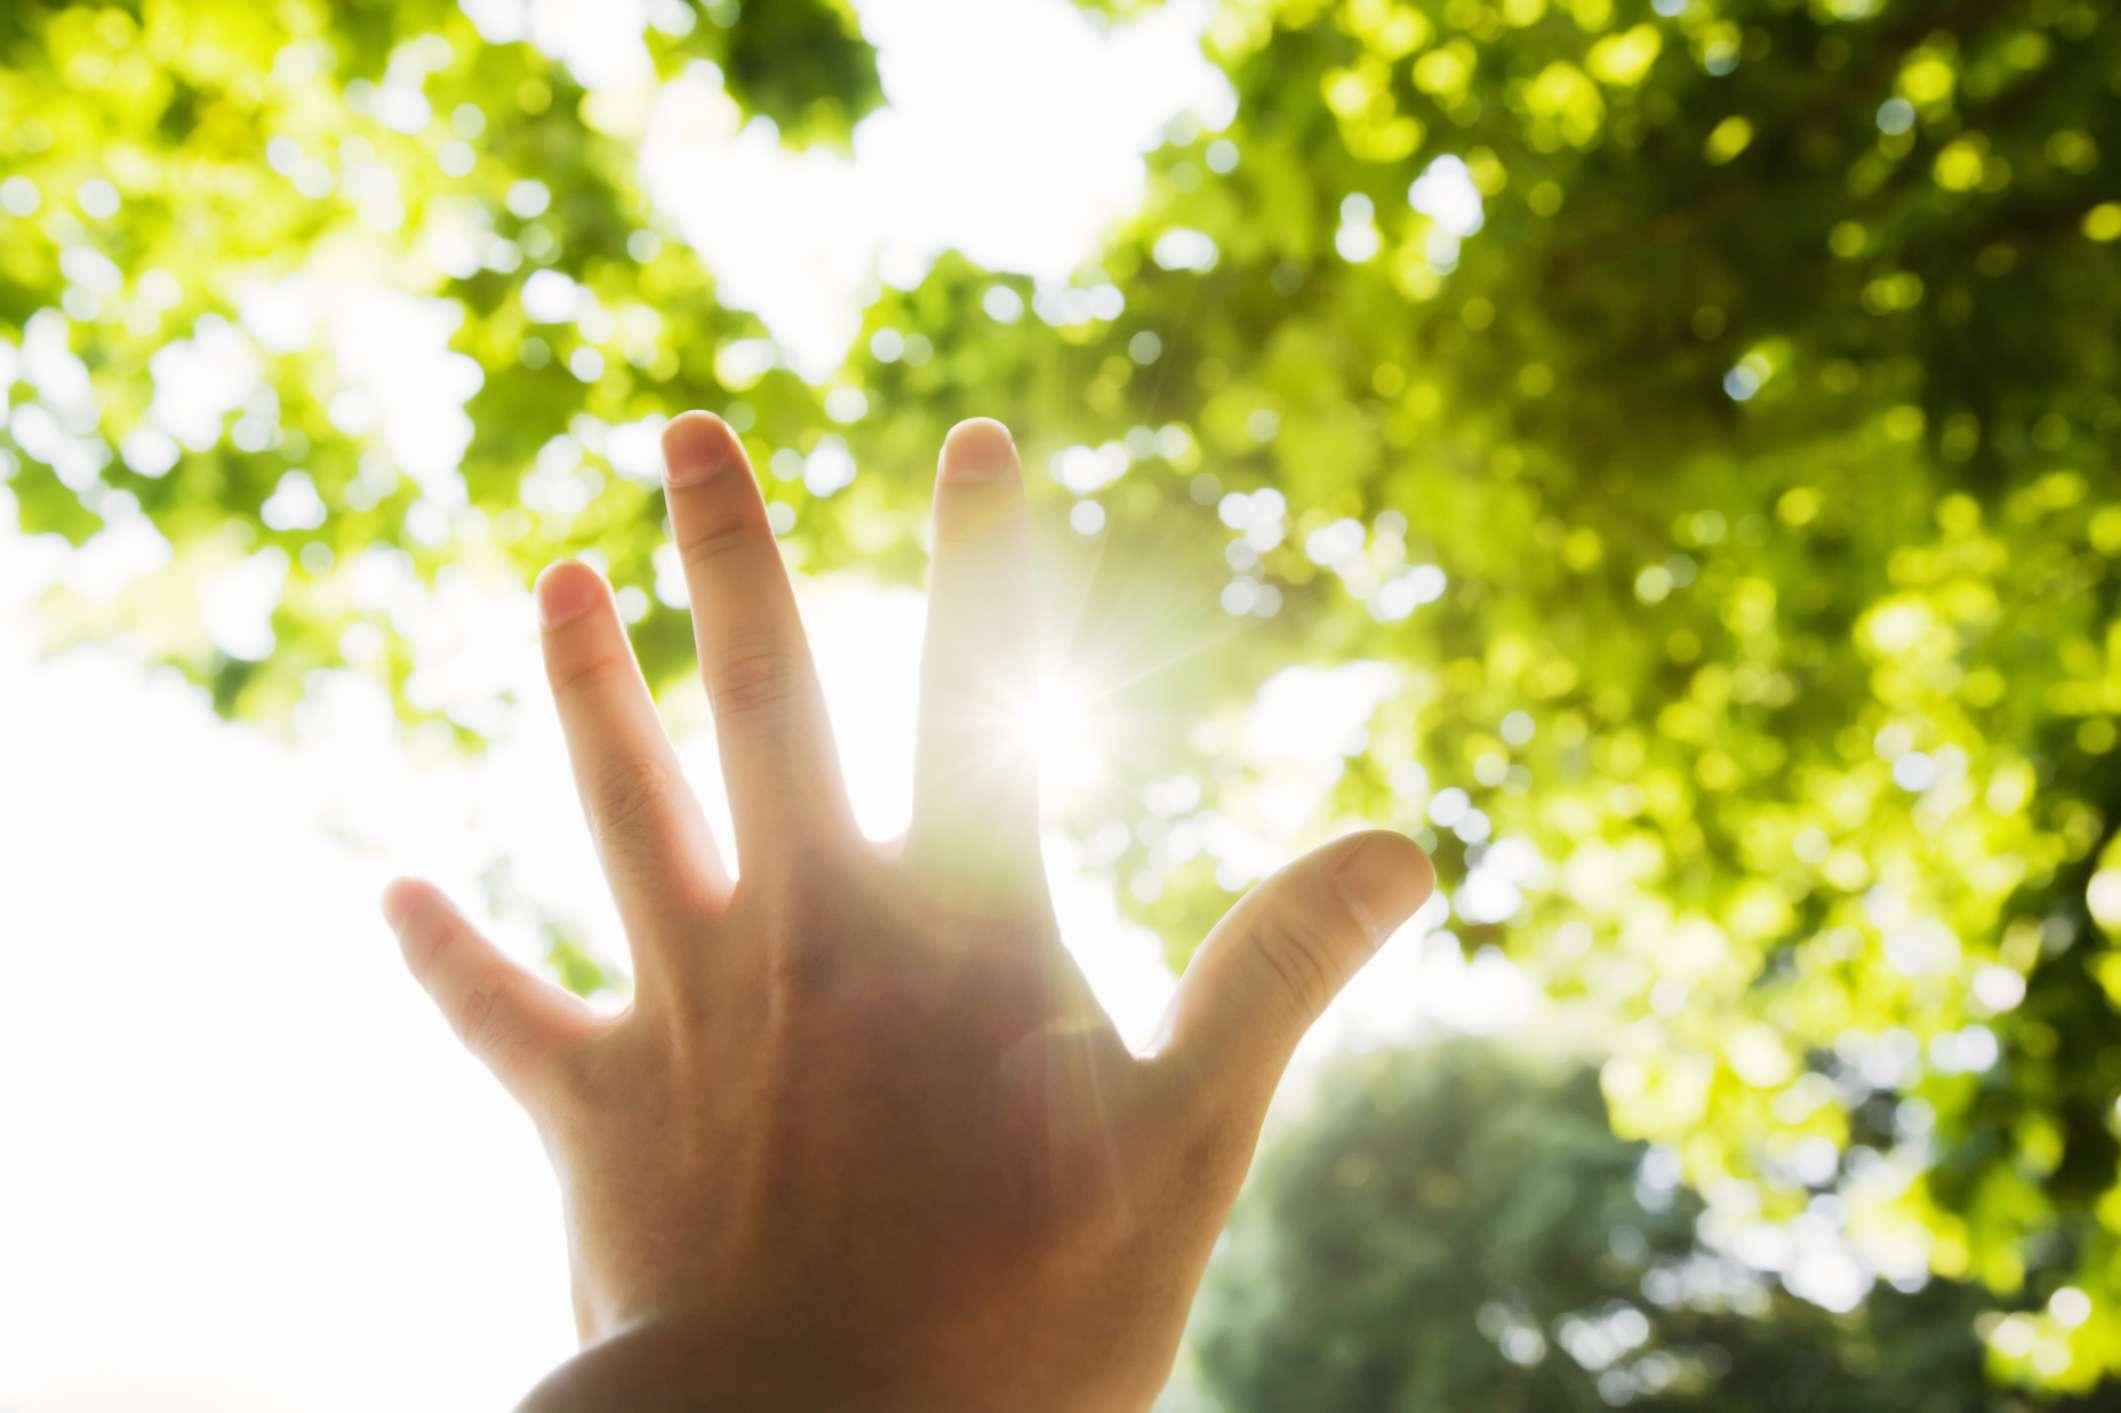 A hand reaching towards the sunlight